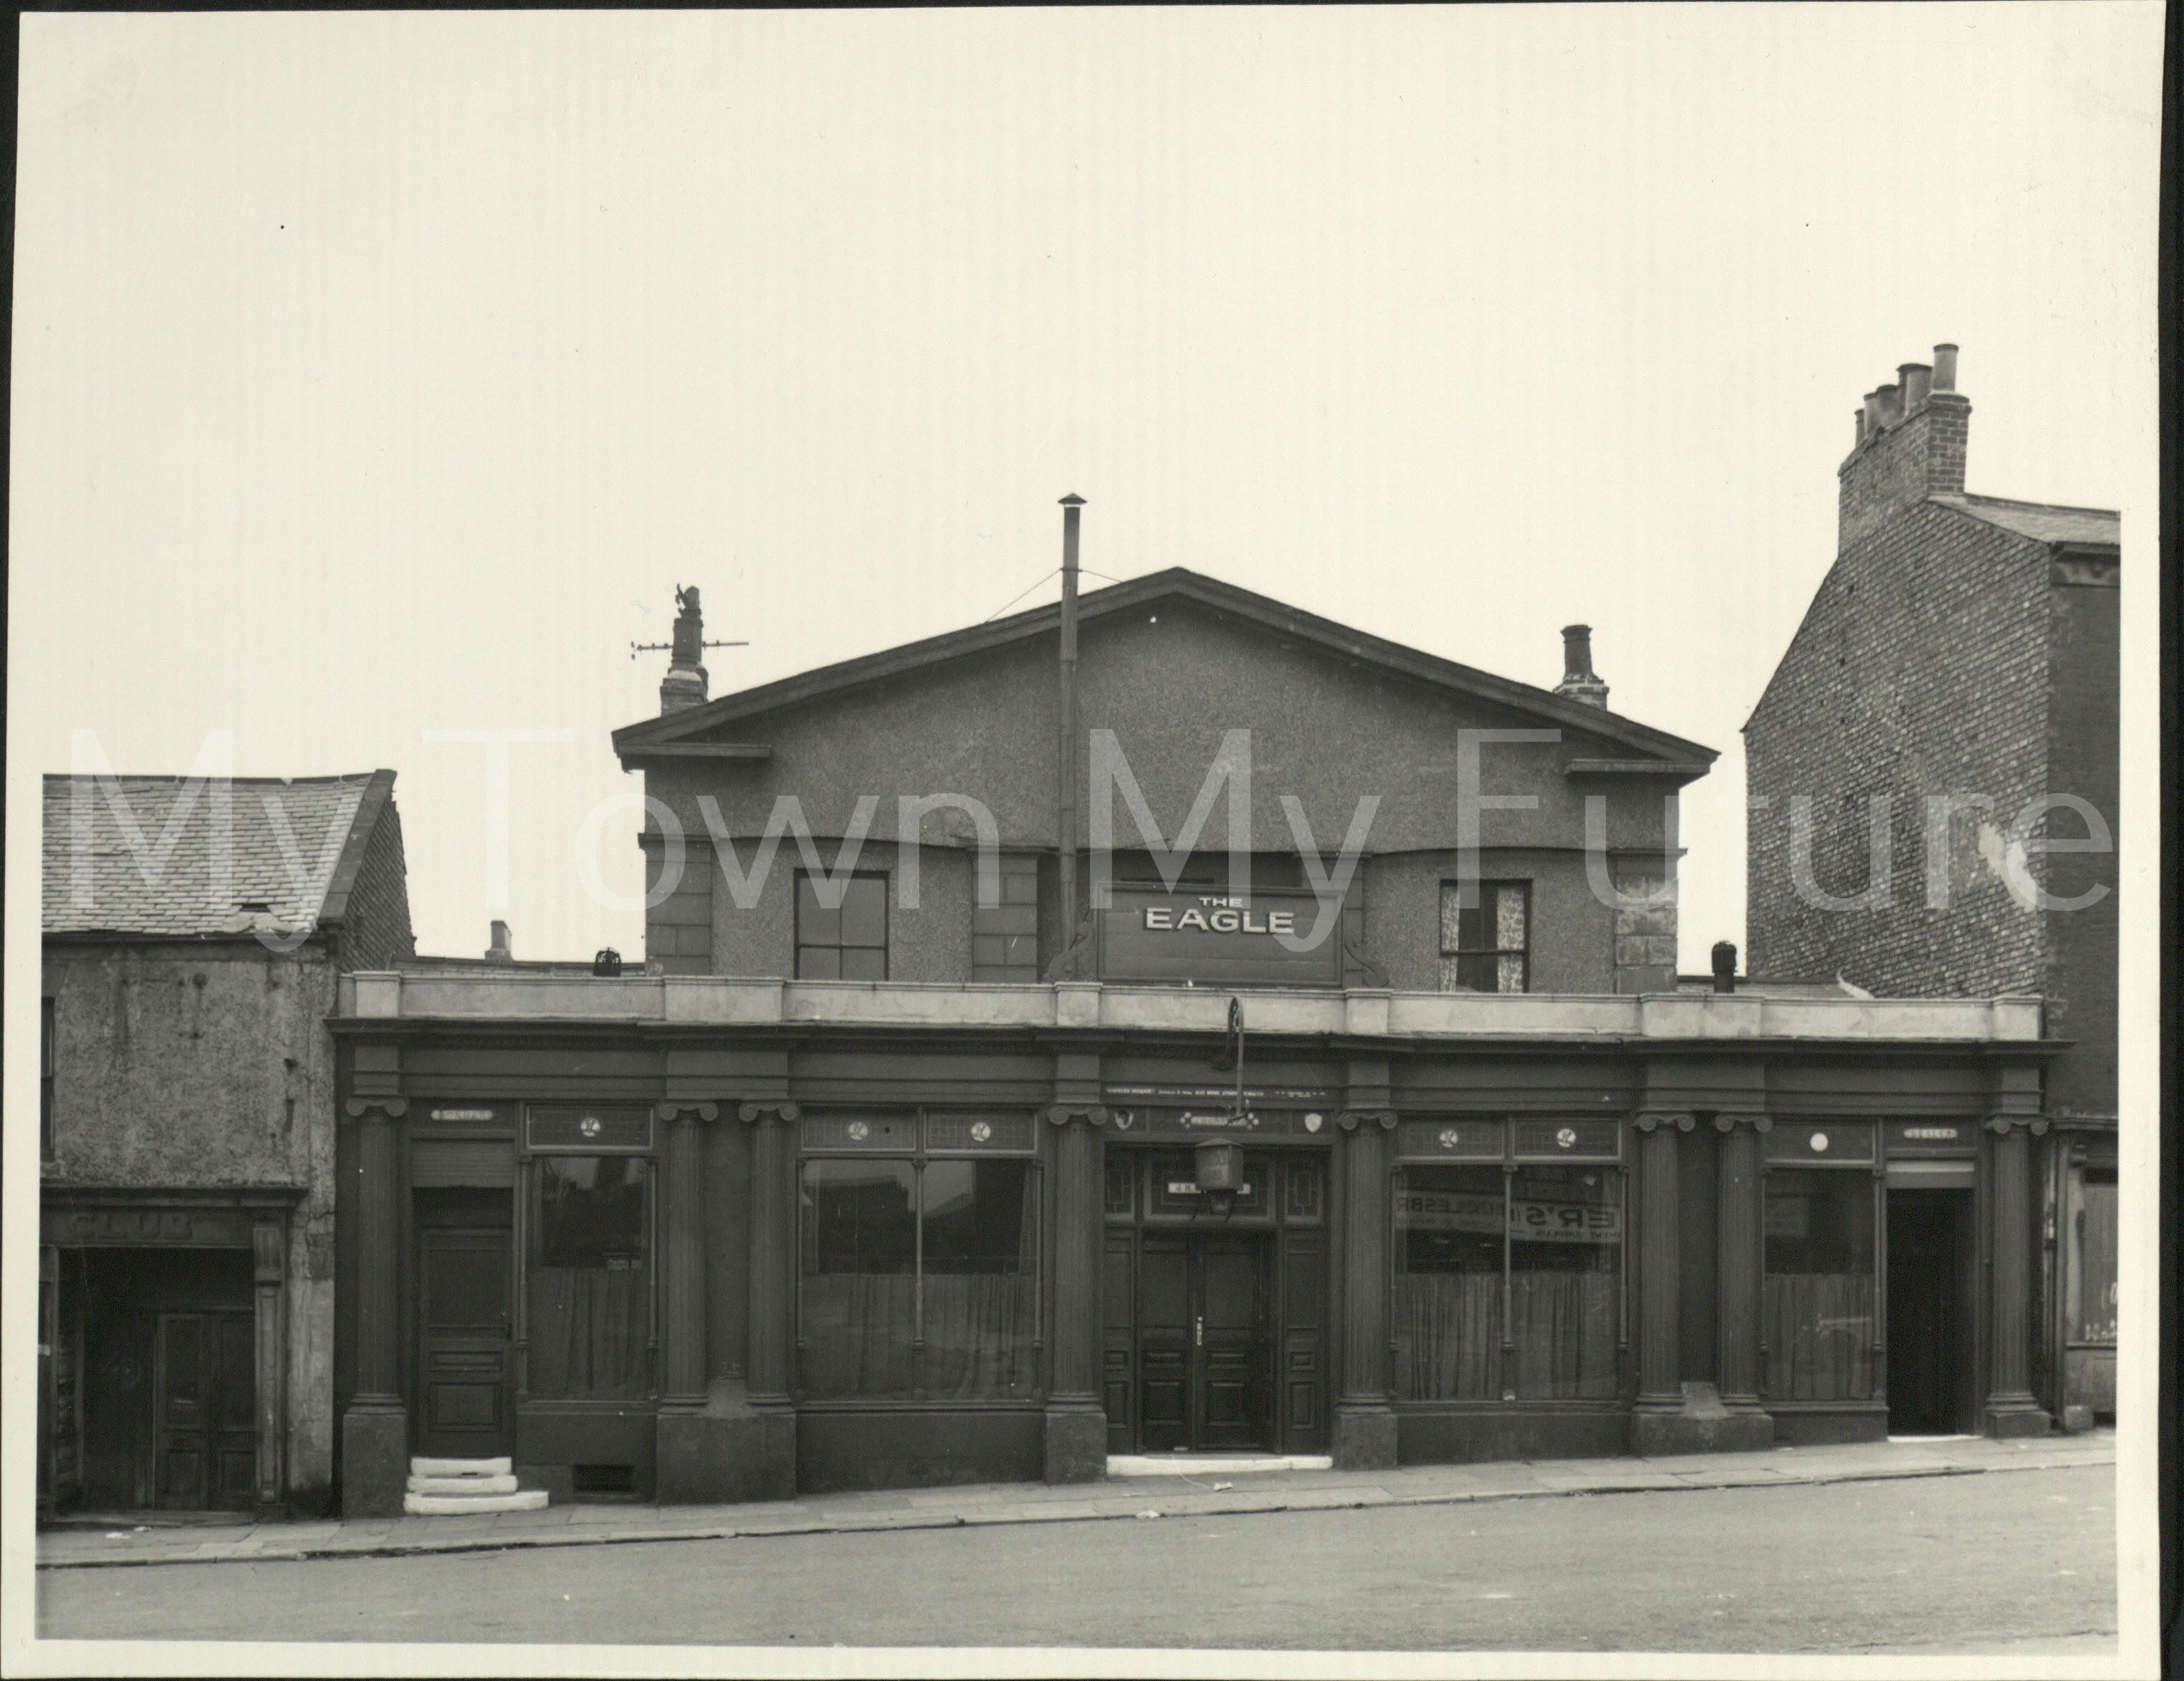 The Eagle, 1857, East Street, St Hilda's. 1954.